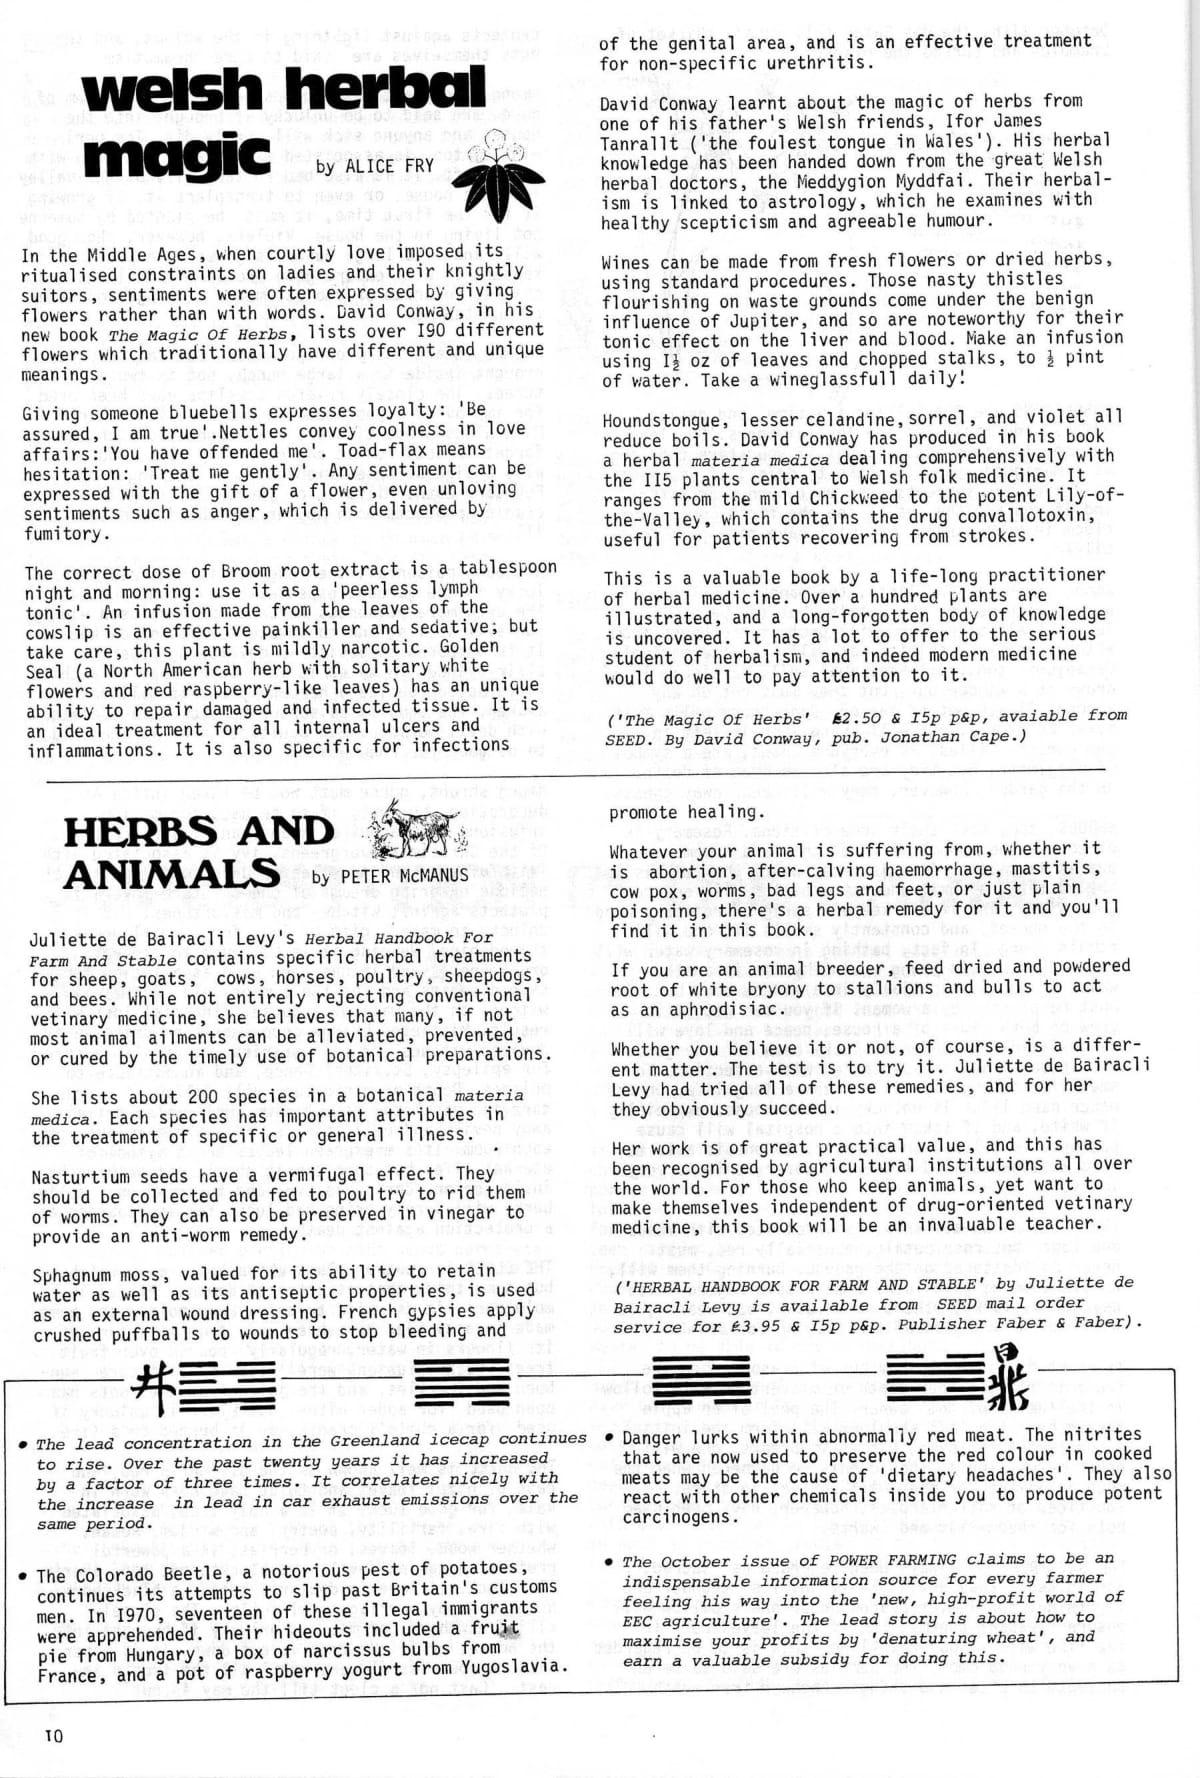 seed-v2-n10-oct1973-10.jpg